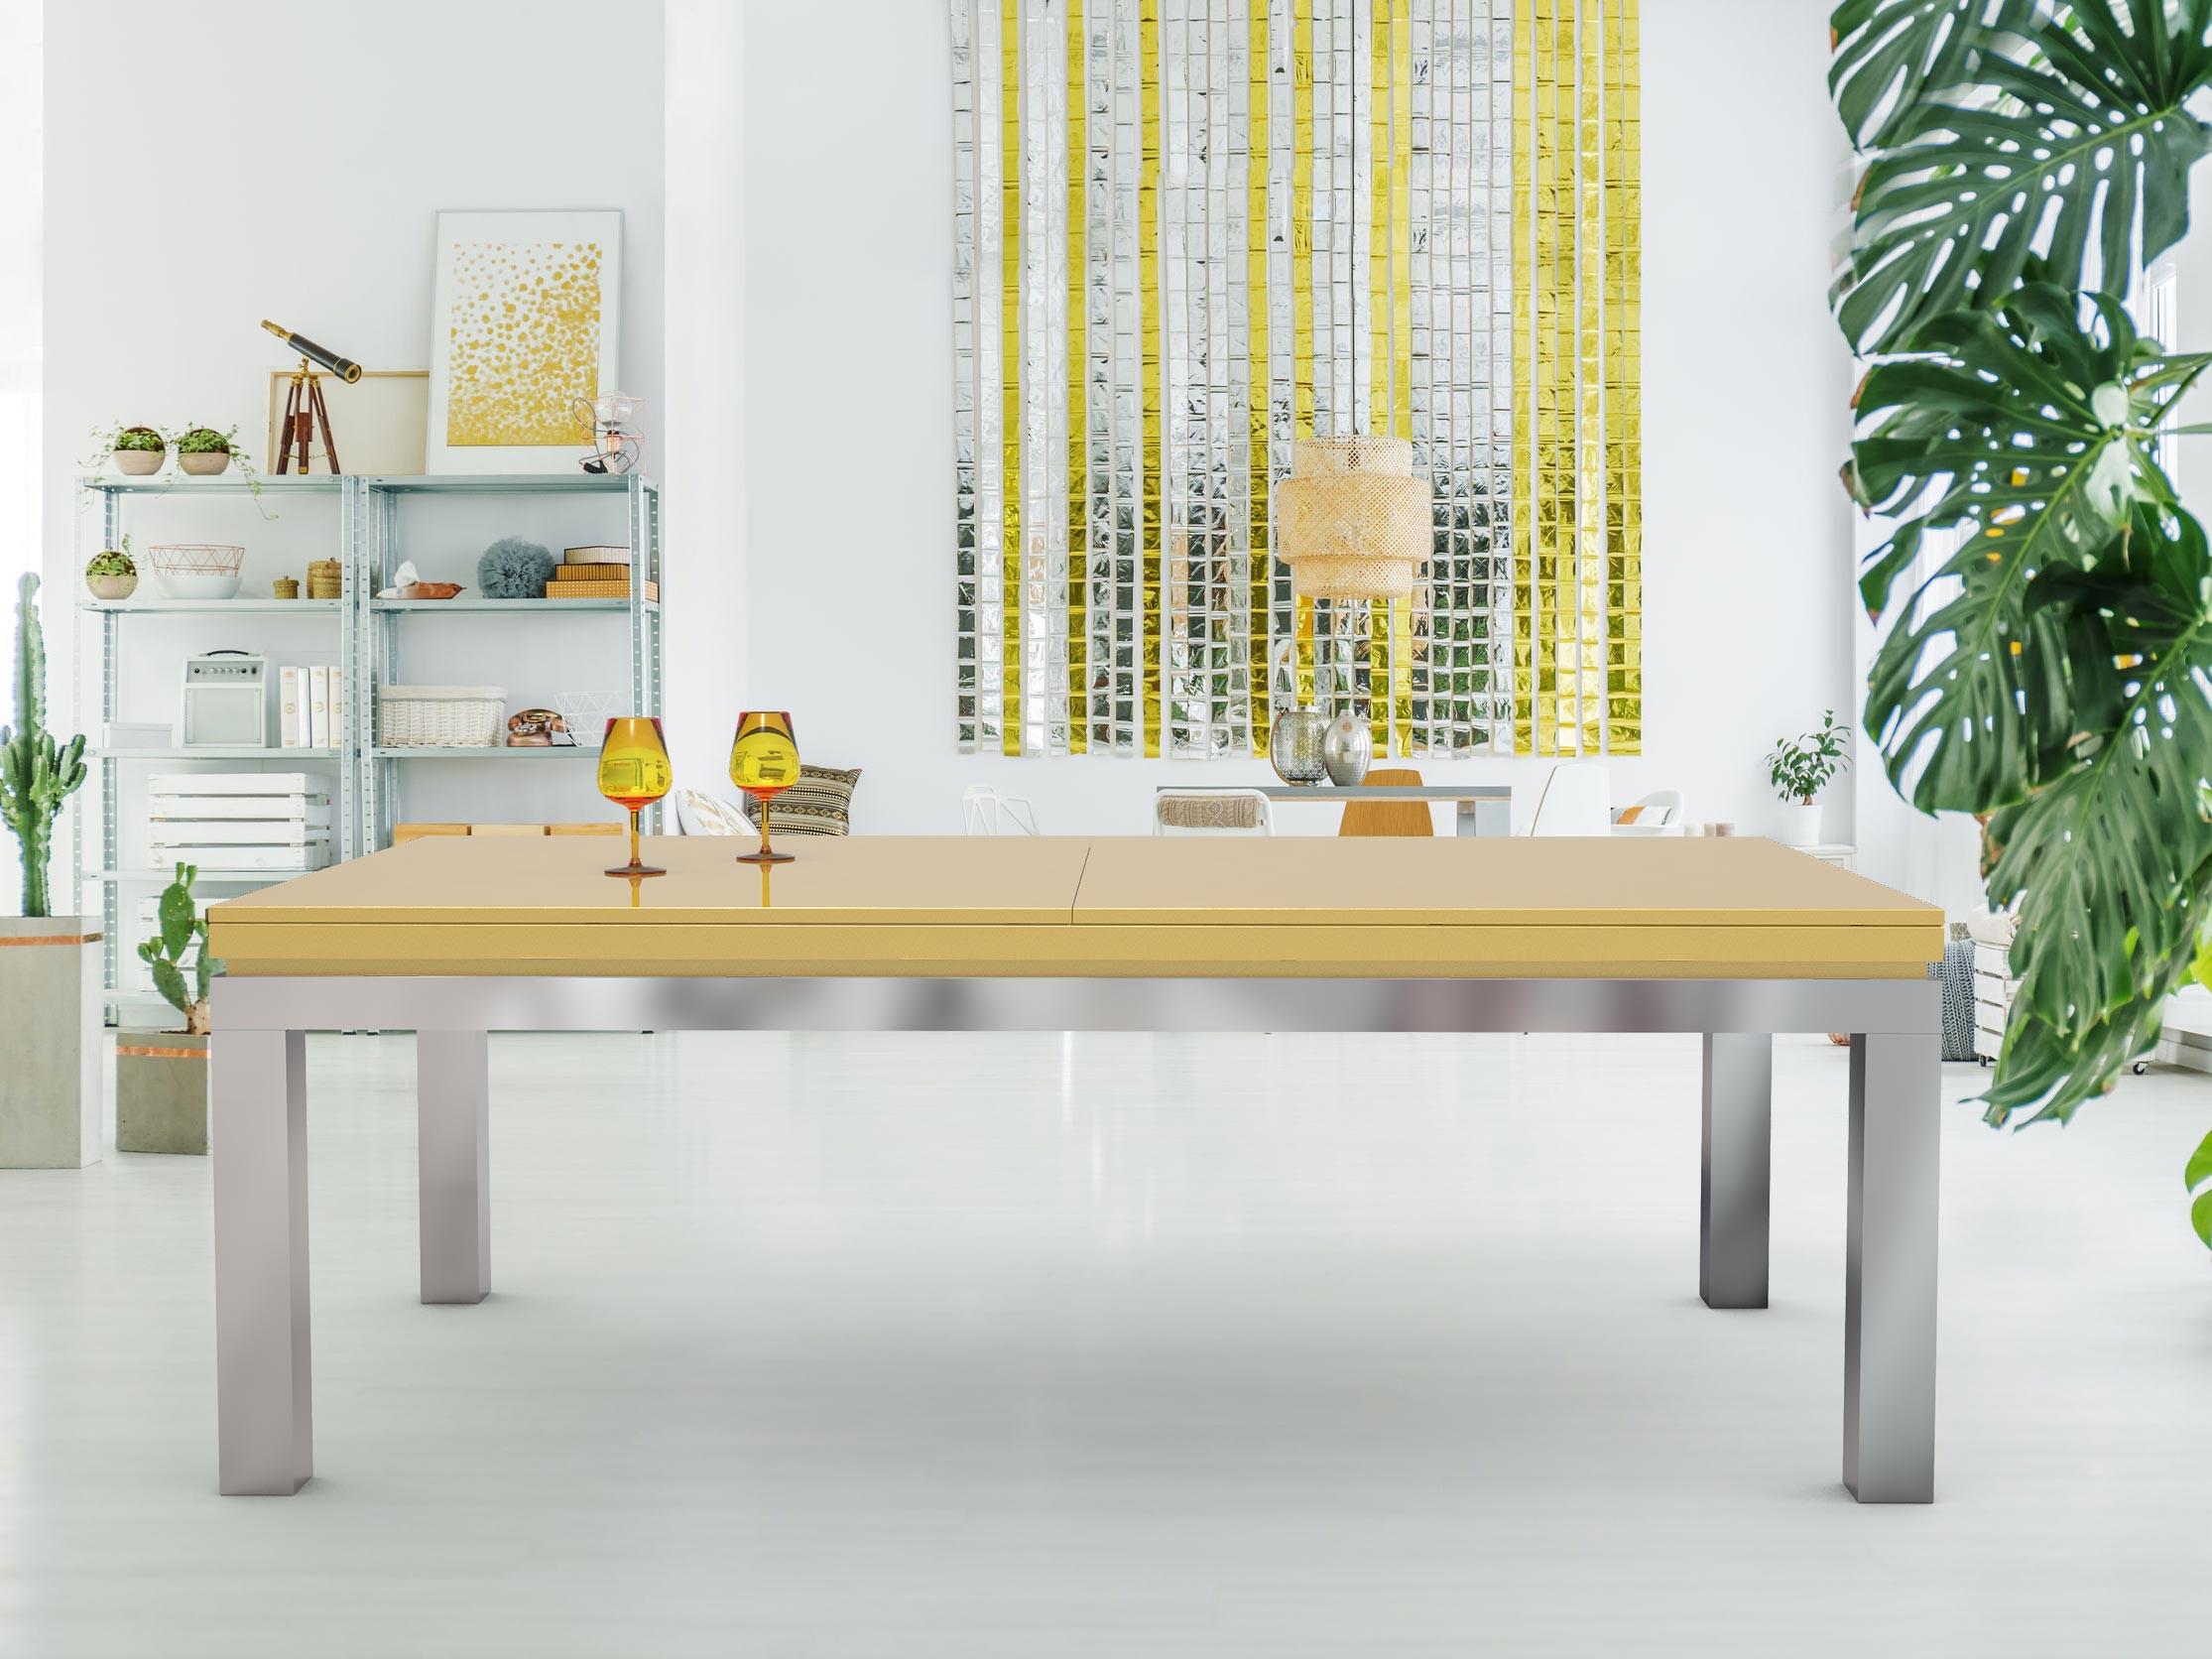 Billard NEW TENDANCE Table Inox - cadre laque nacré Pearl Gold 1036 - plateau ST